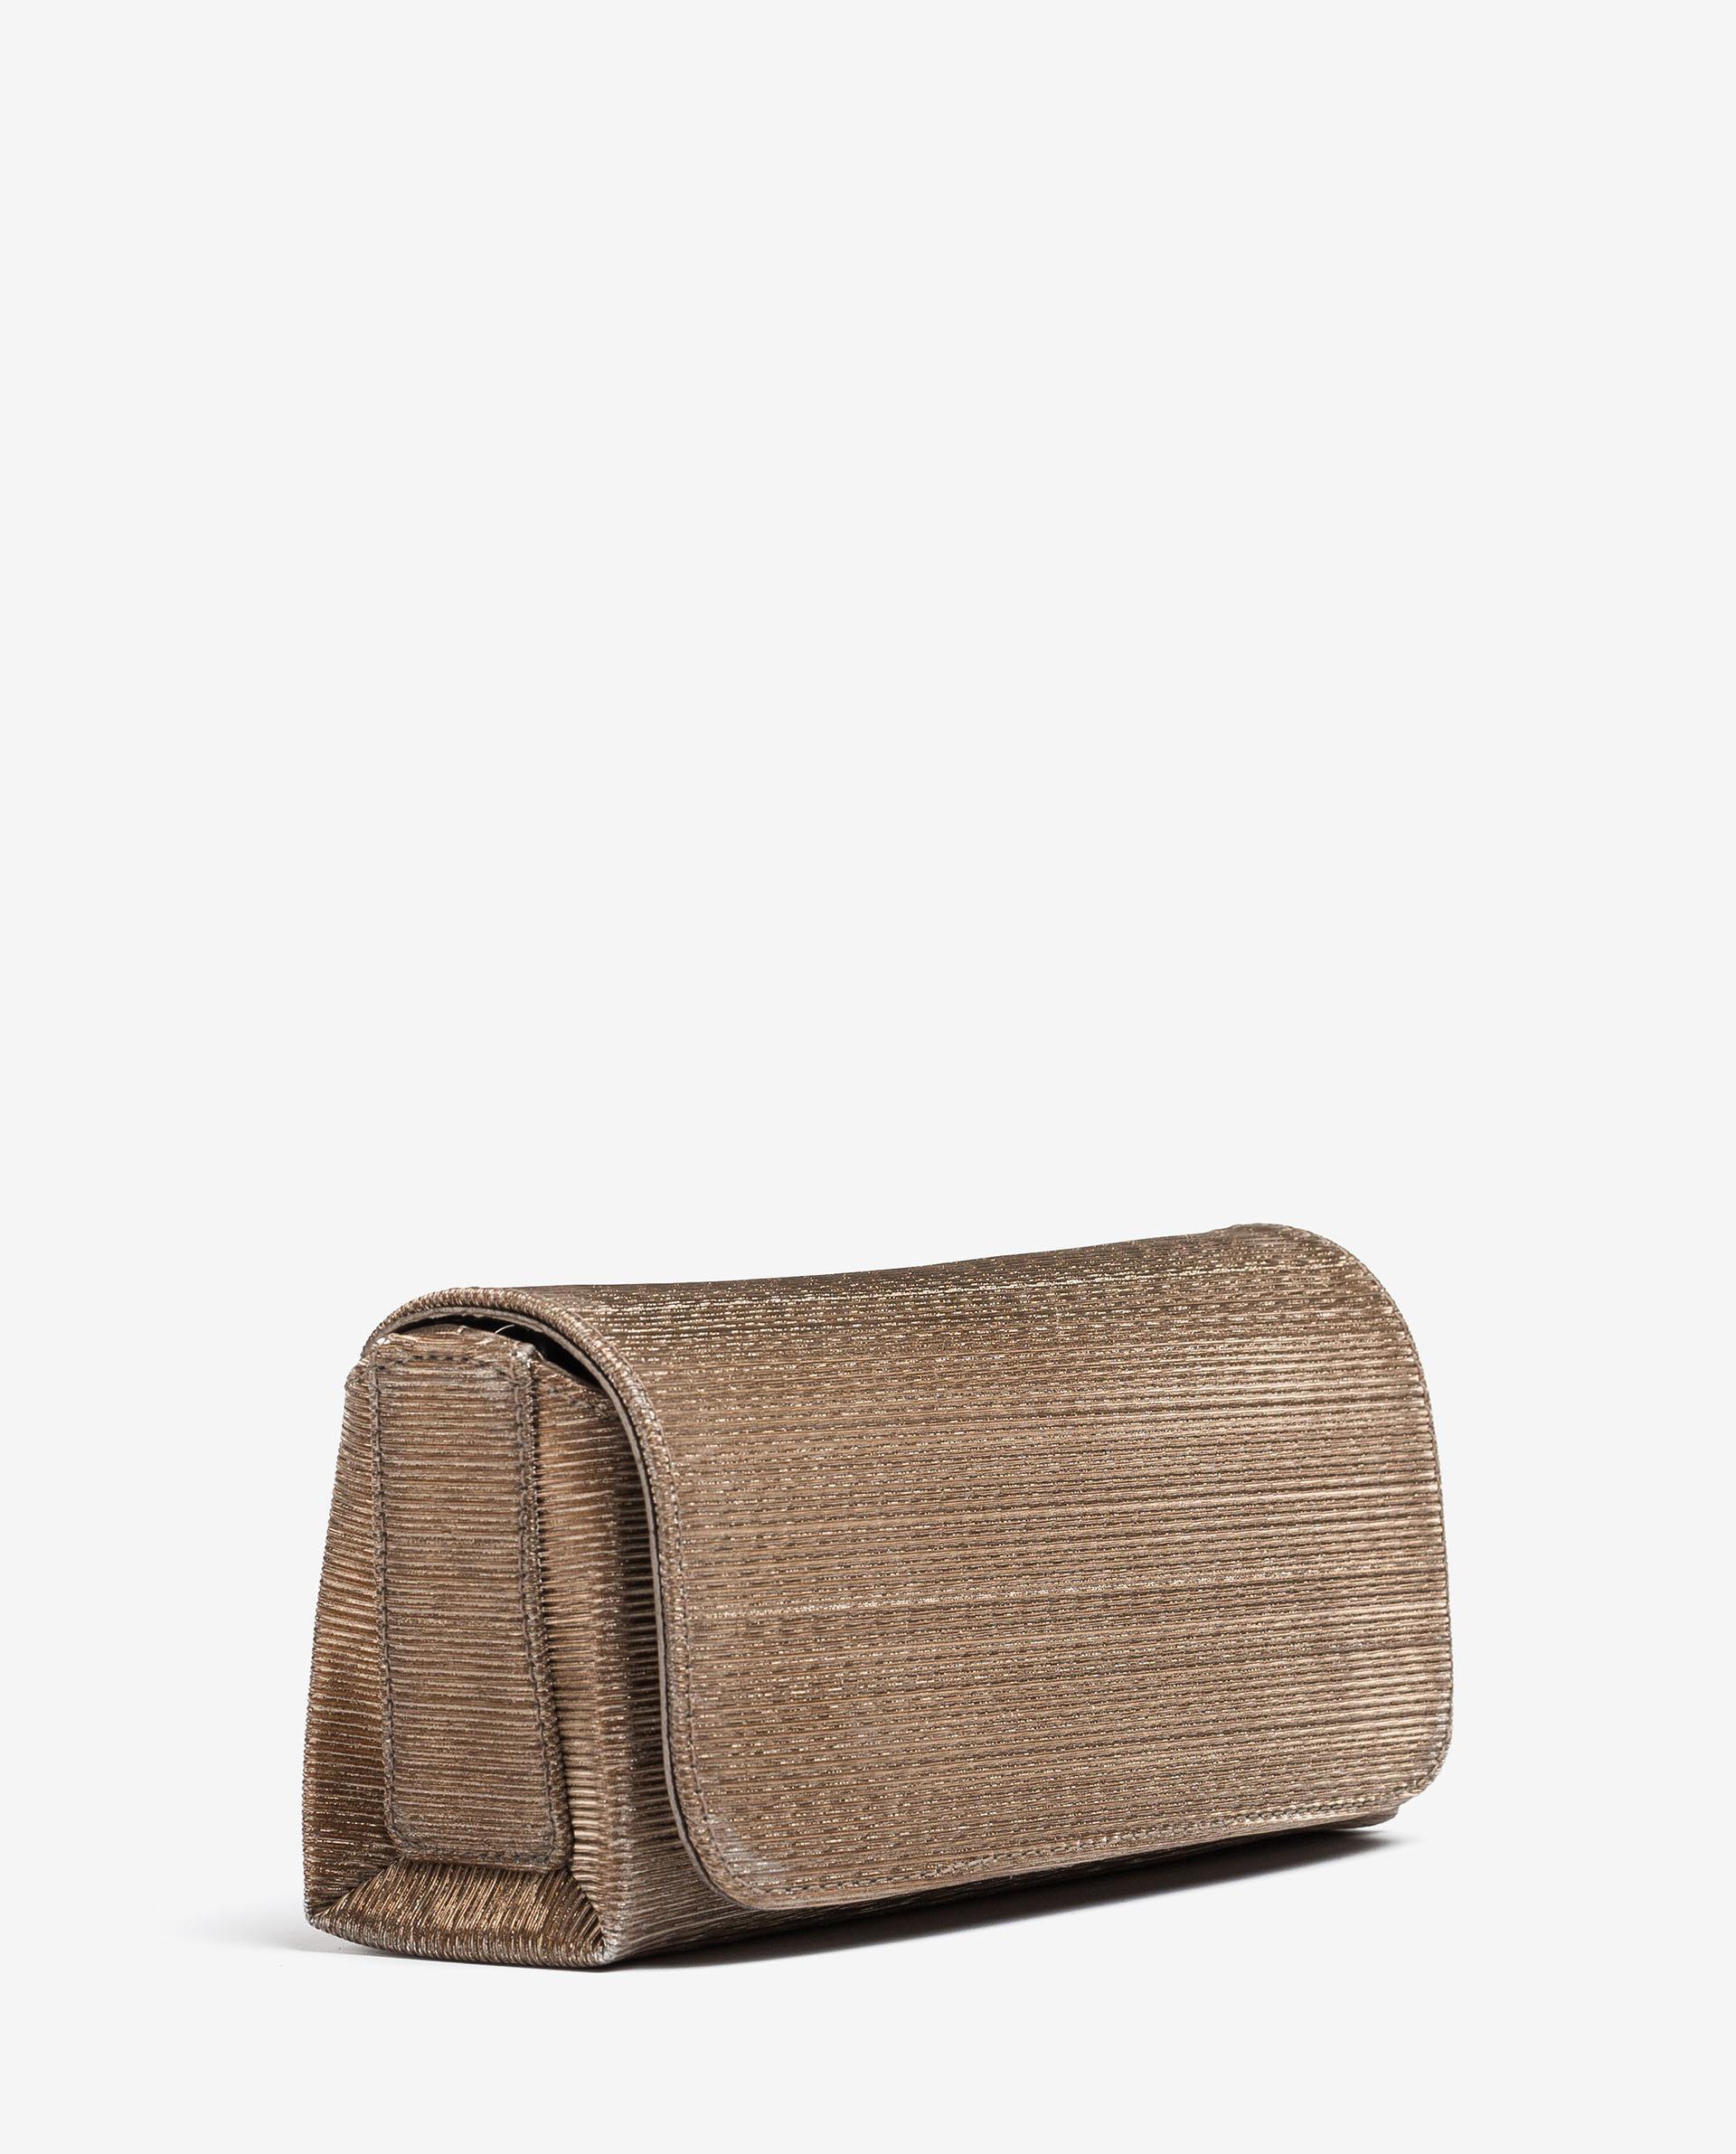 UNISA Copper coloured handbag ZDREAM_21_RAD 2